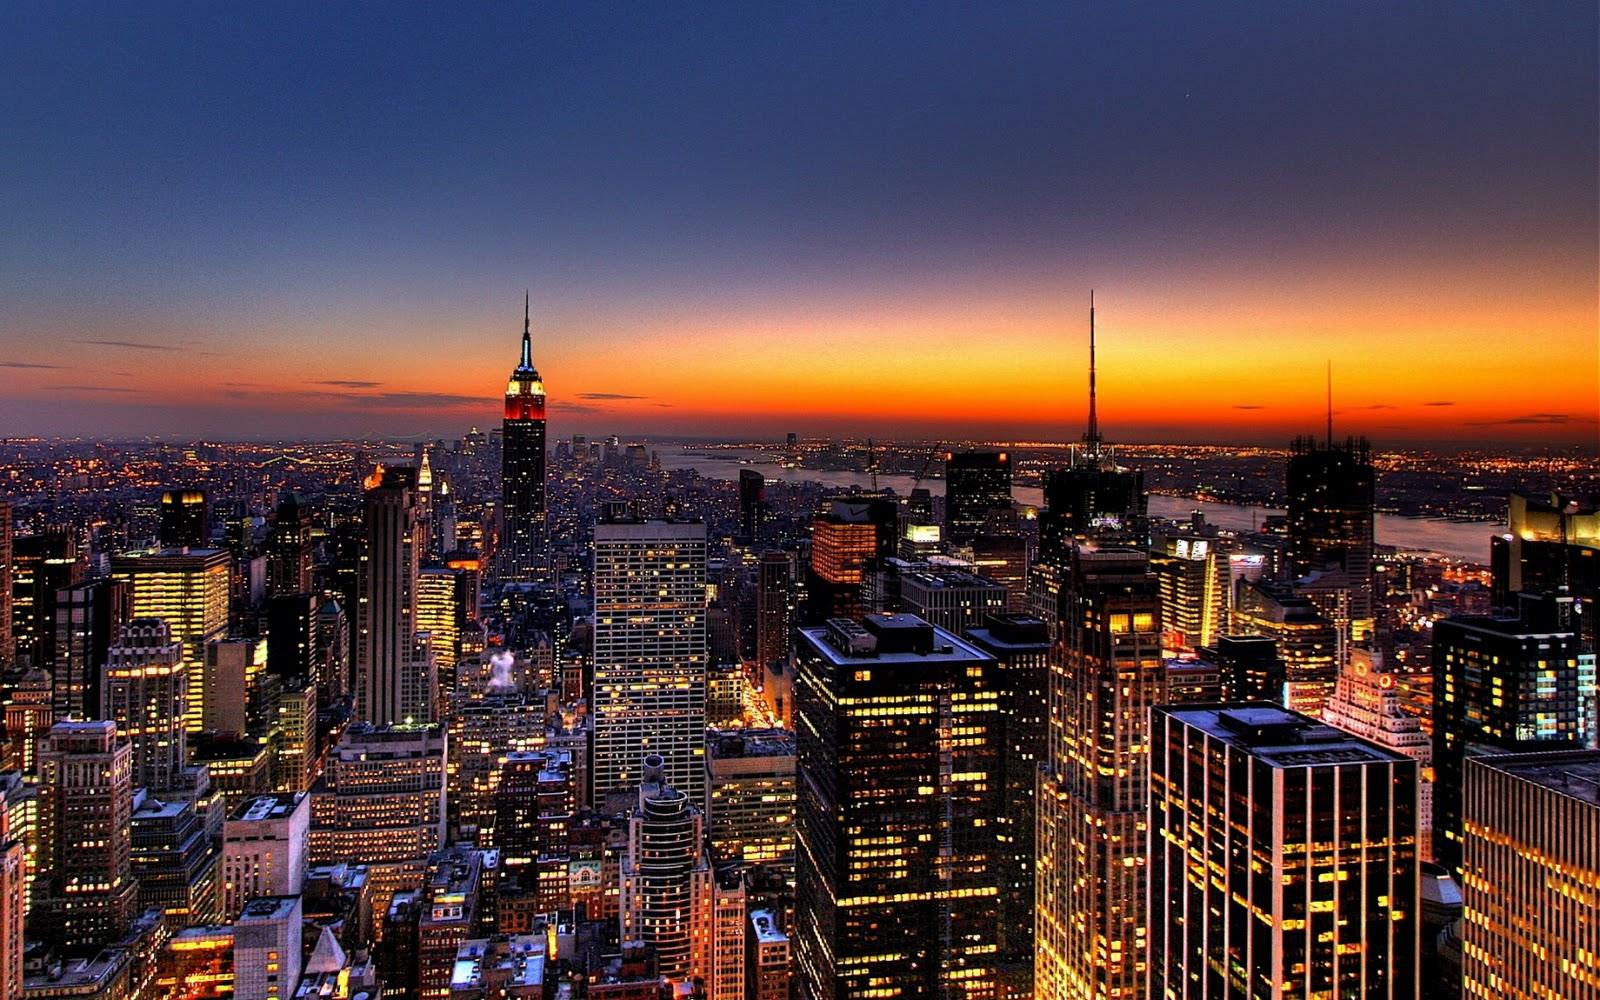 Wallpapers Club new york city wallpaper widescreen 1600x1000